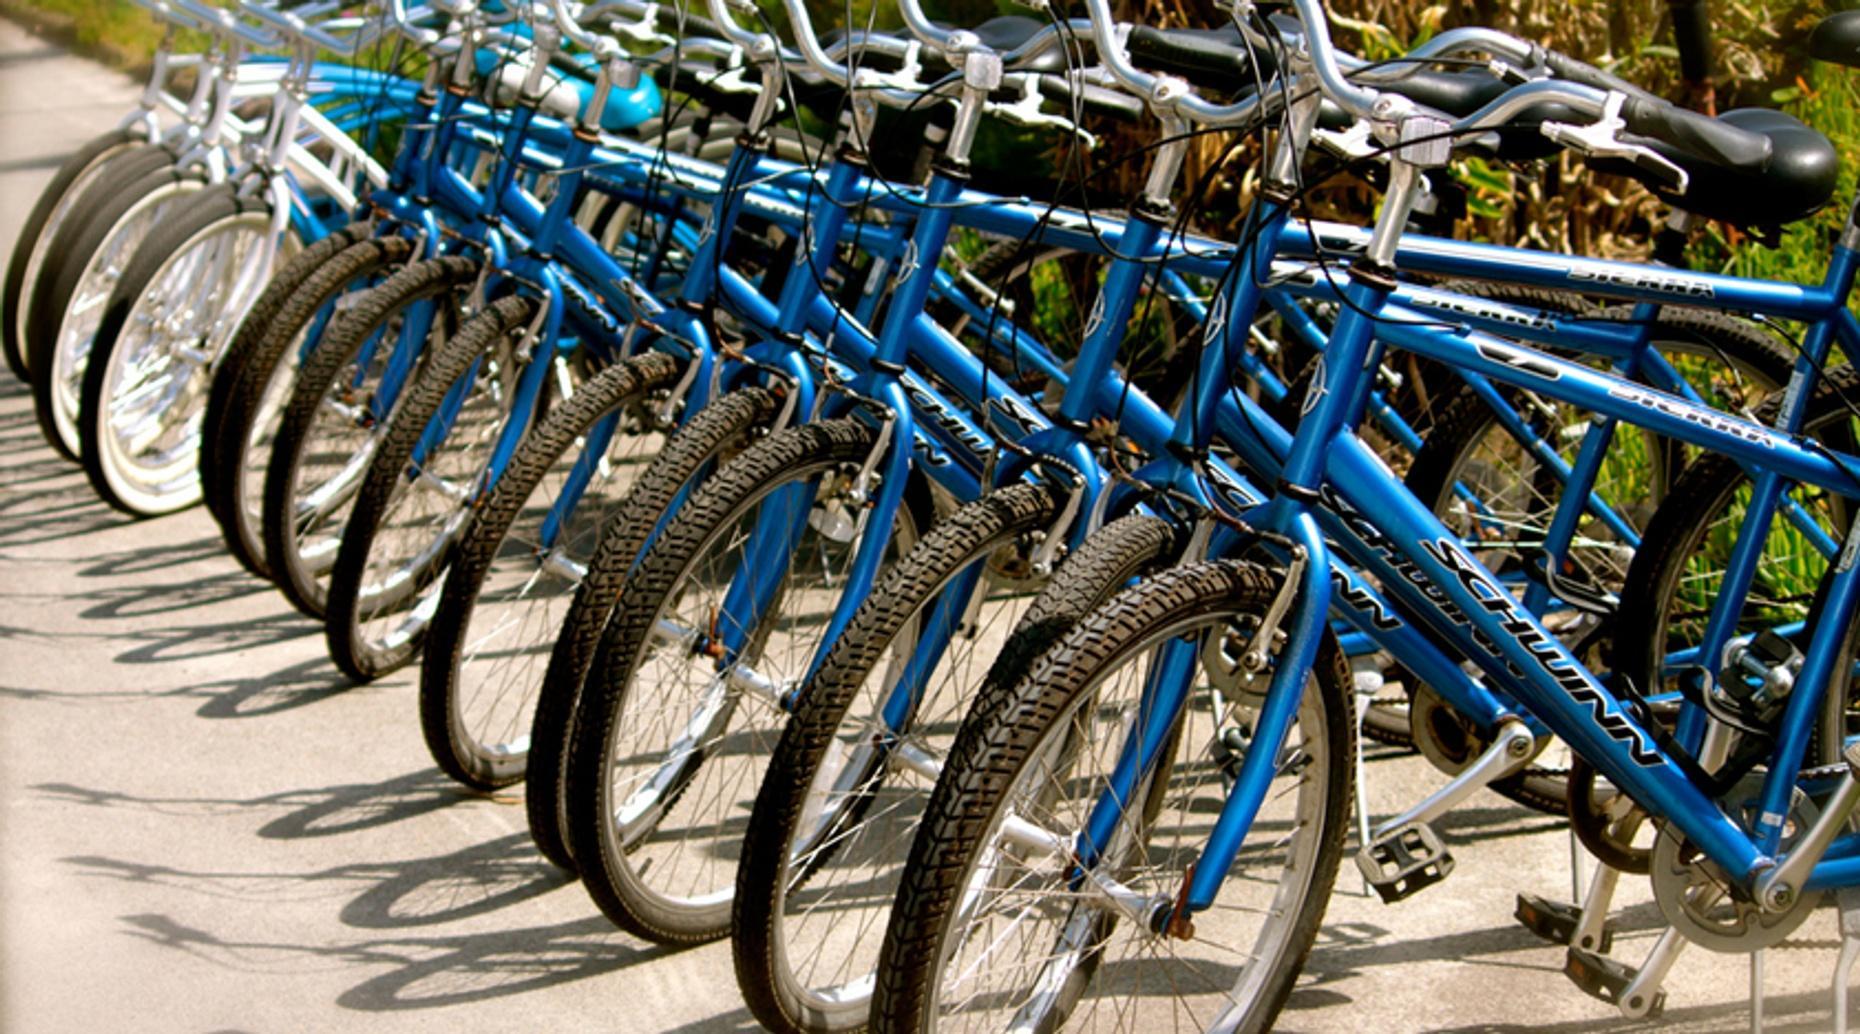 Biking Tour & Train Ride from Anchorage